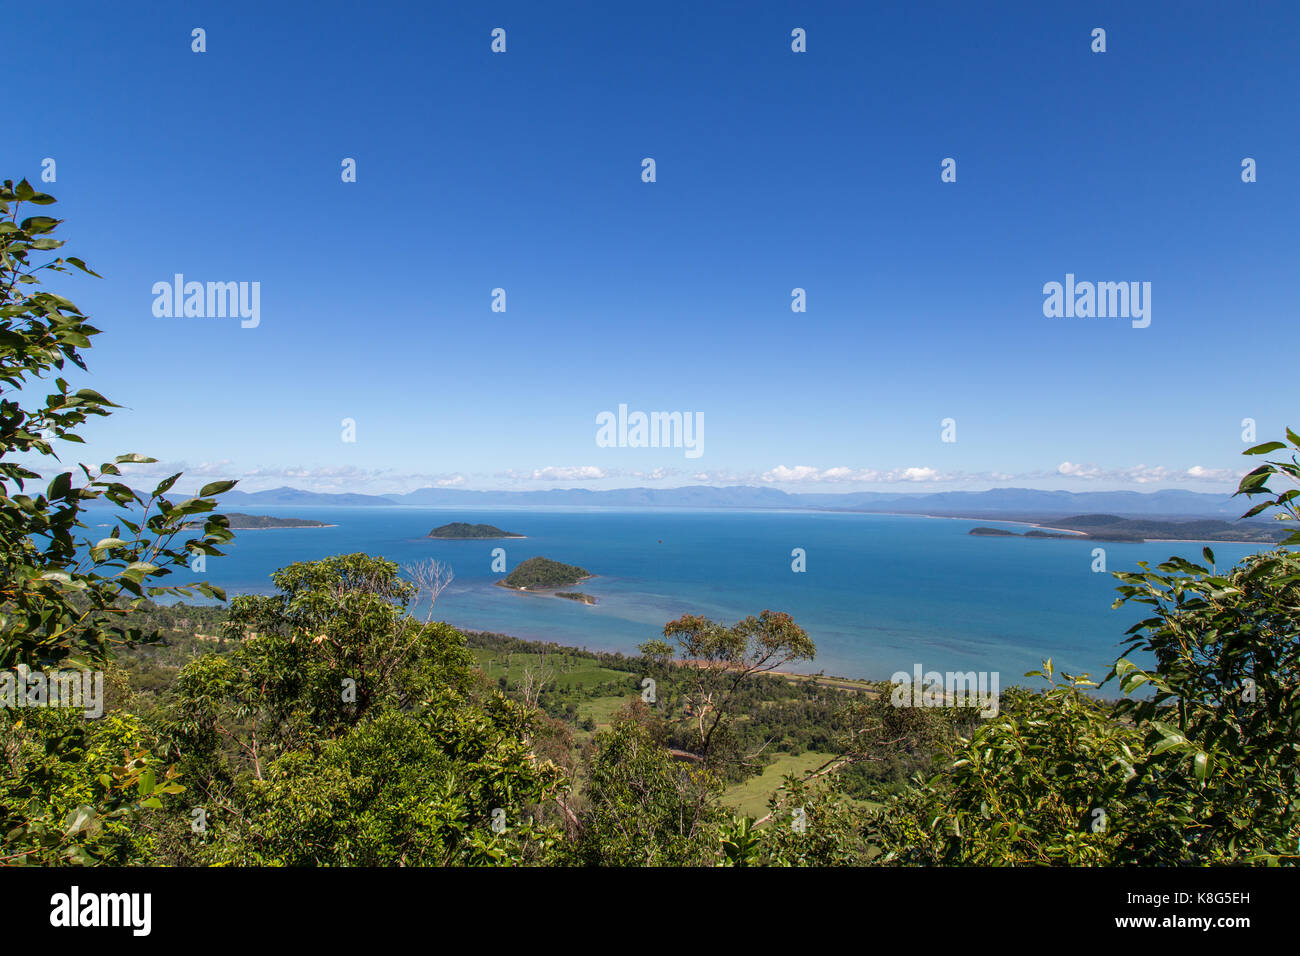 Dunk Island Queensland: Dunk Island Queensland Stock Photos & Dunk Island